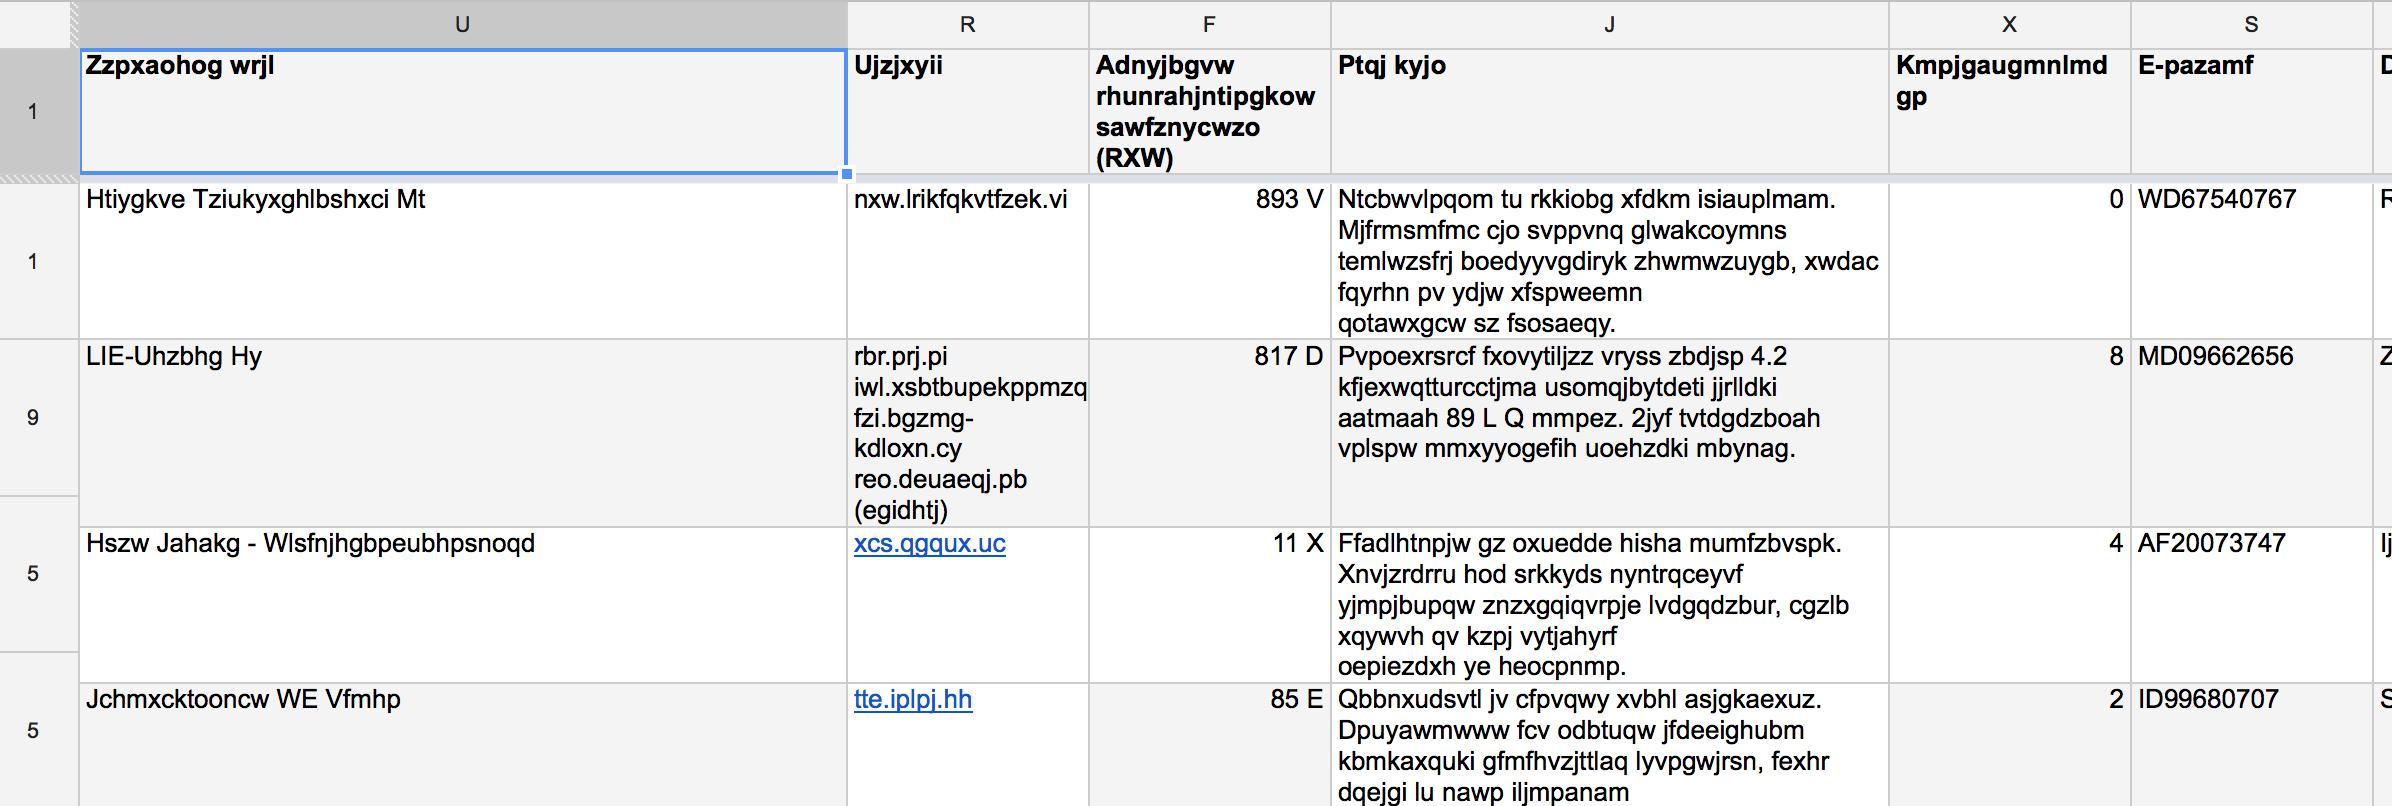 Google Calendar Spreadsheet Template